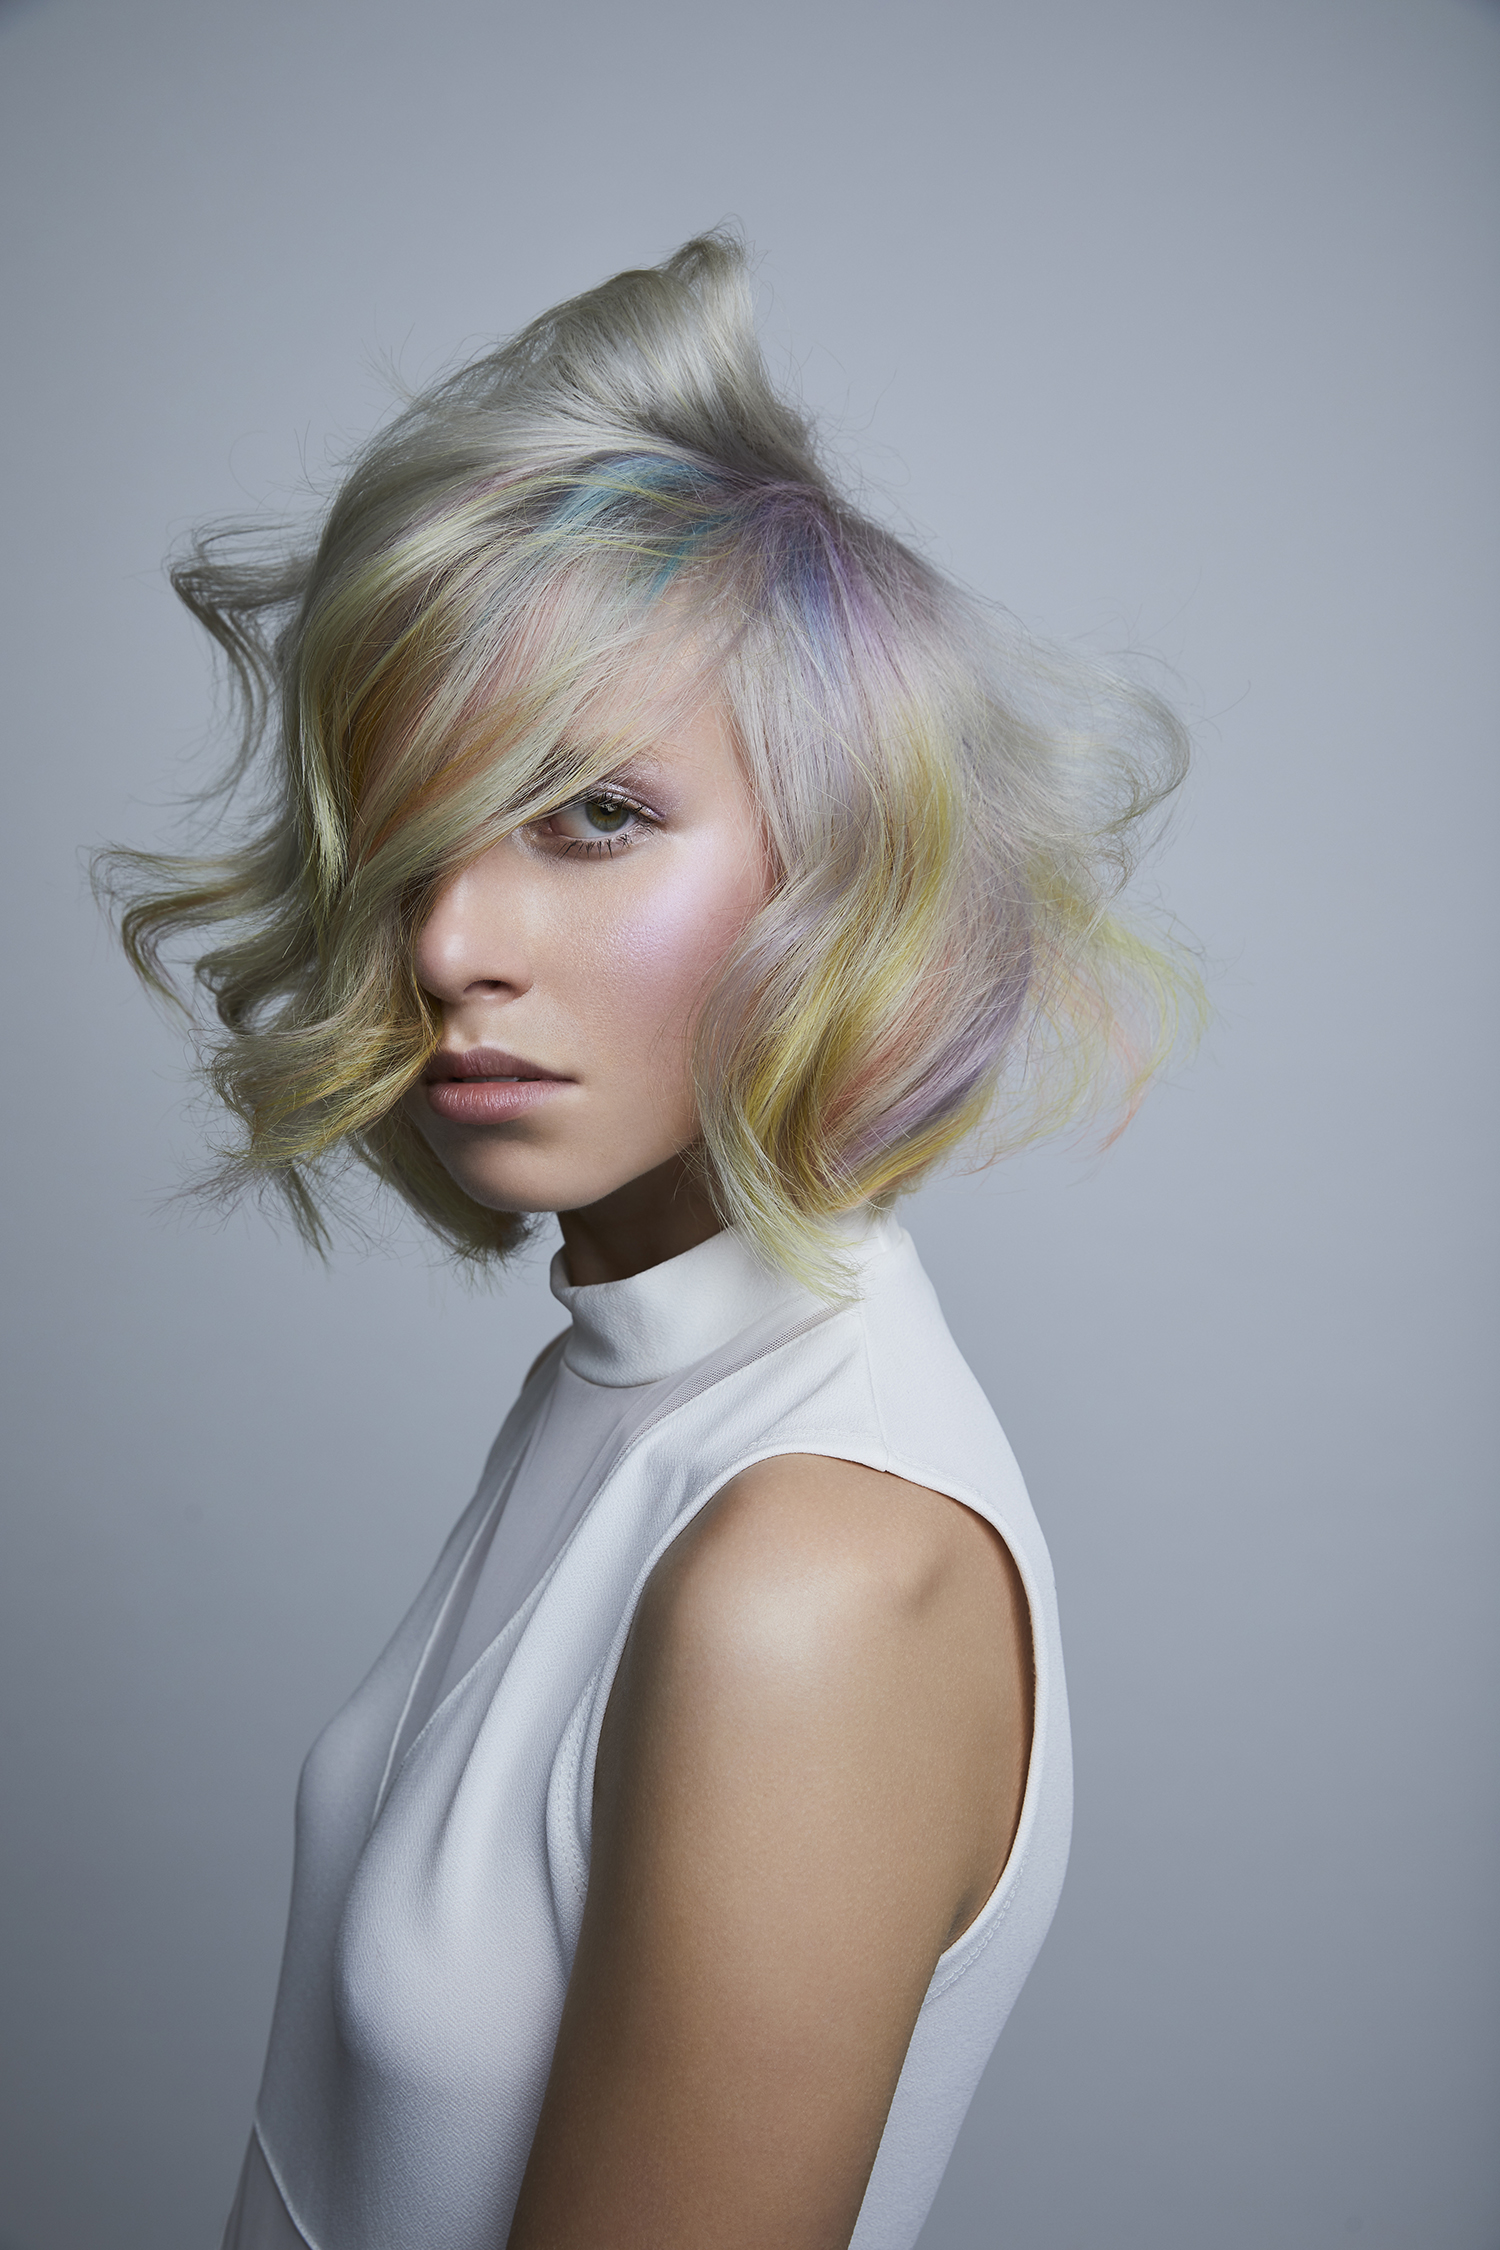 ahda+2019+unicorn+hair+pastel+haarfarbe+friseur+wien+1060+hairdresser+vienna+gumpendorfer+strasse+danny+van+tuijl+color+technician+danny+van+tuijl2.jpeg